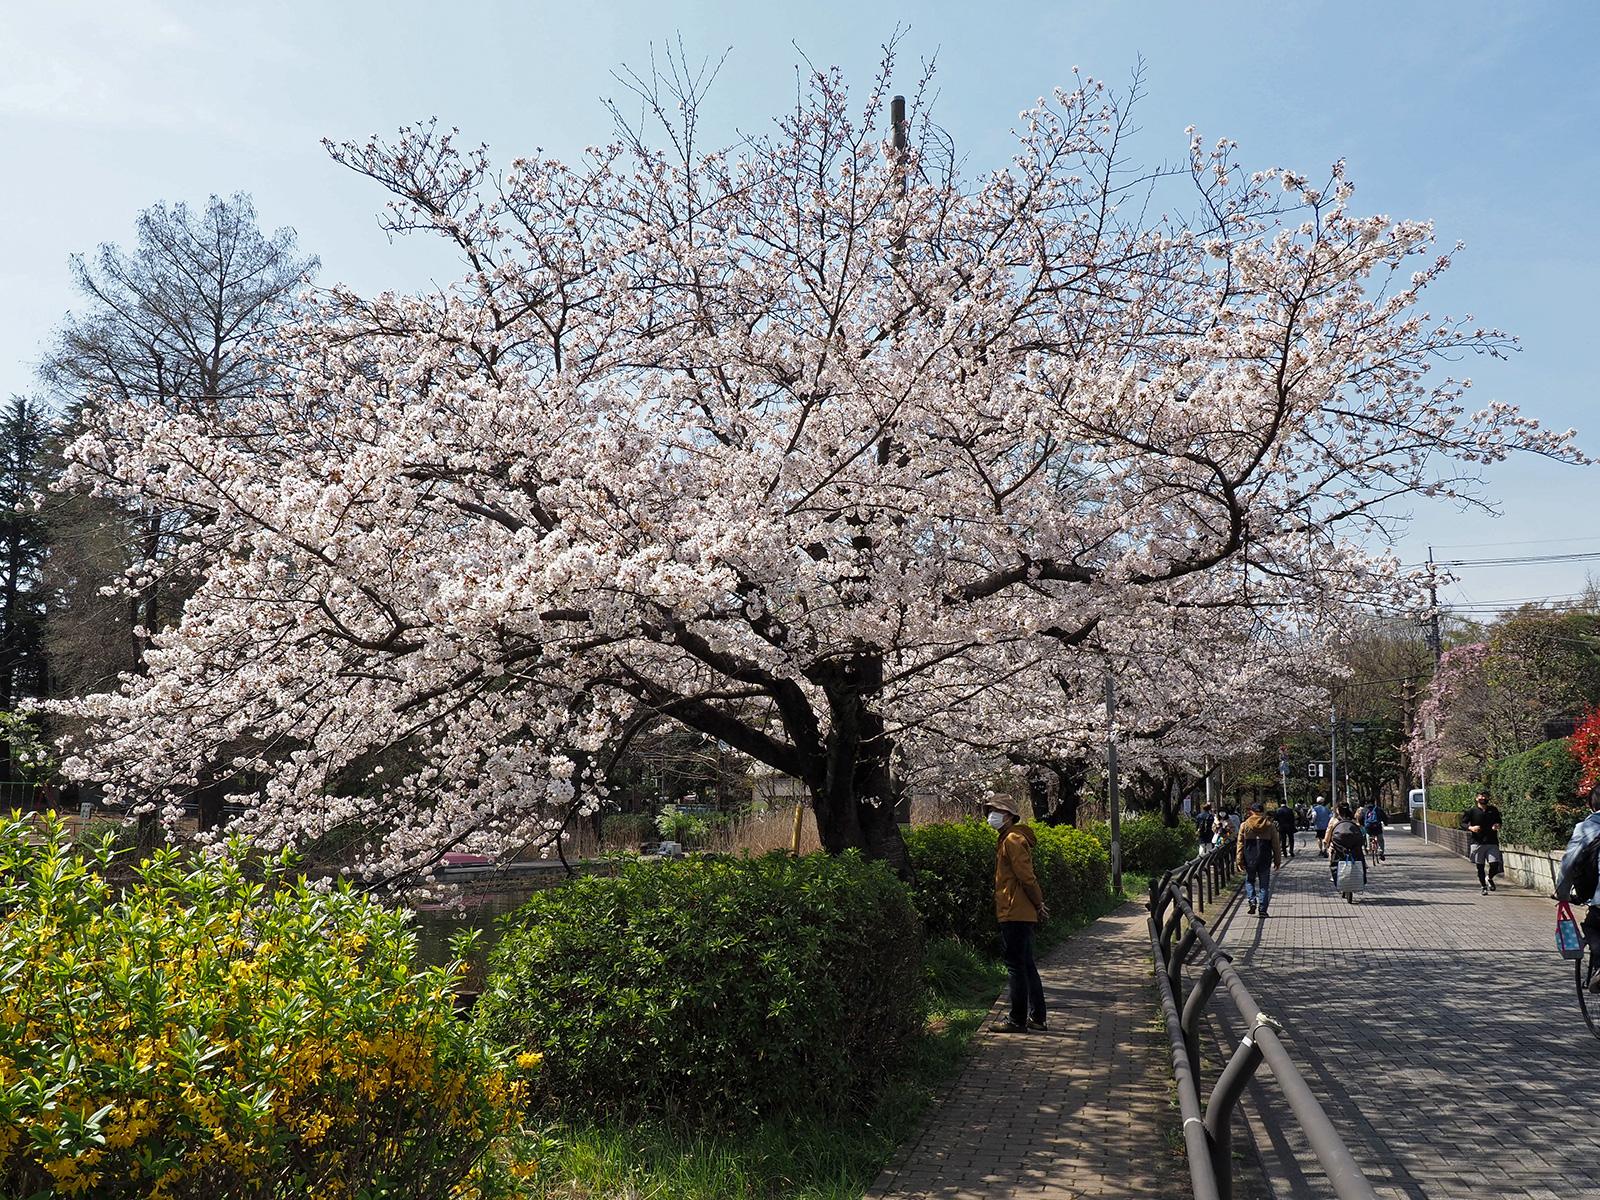 OM-D E-M1 Mark IIで撮り歩き~in 石神井公園~桜編